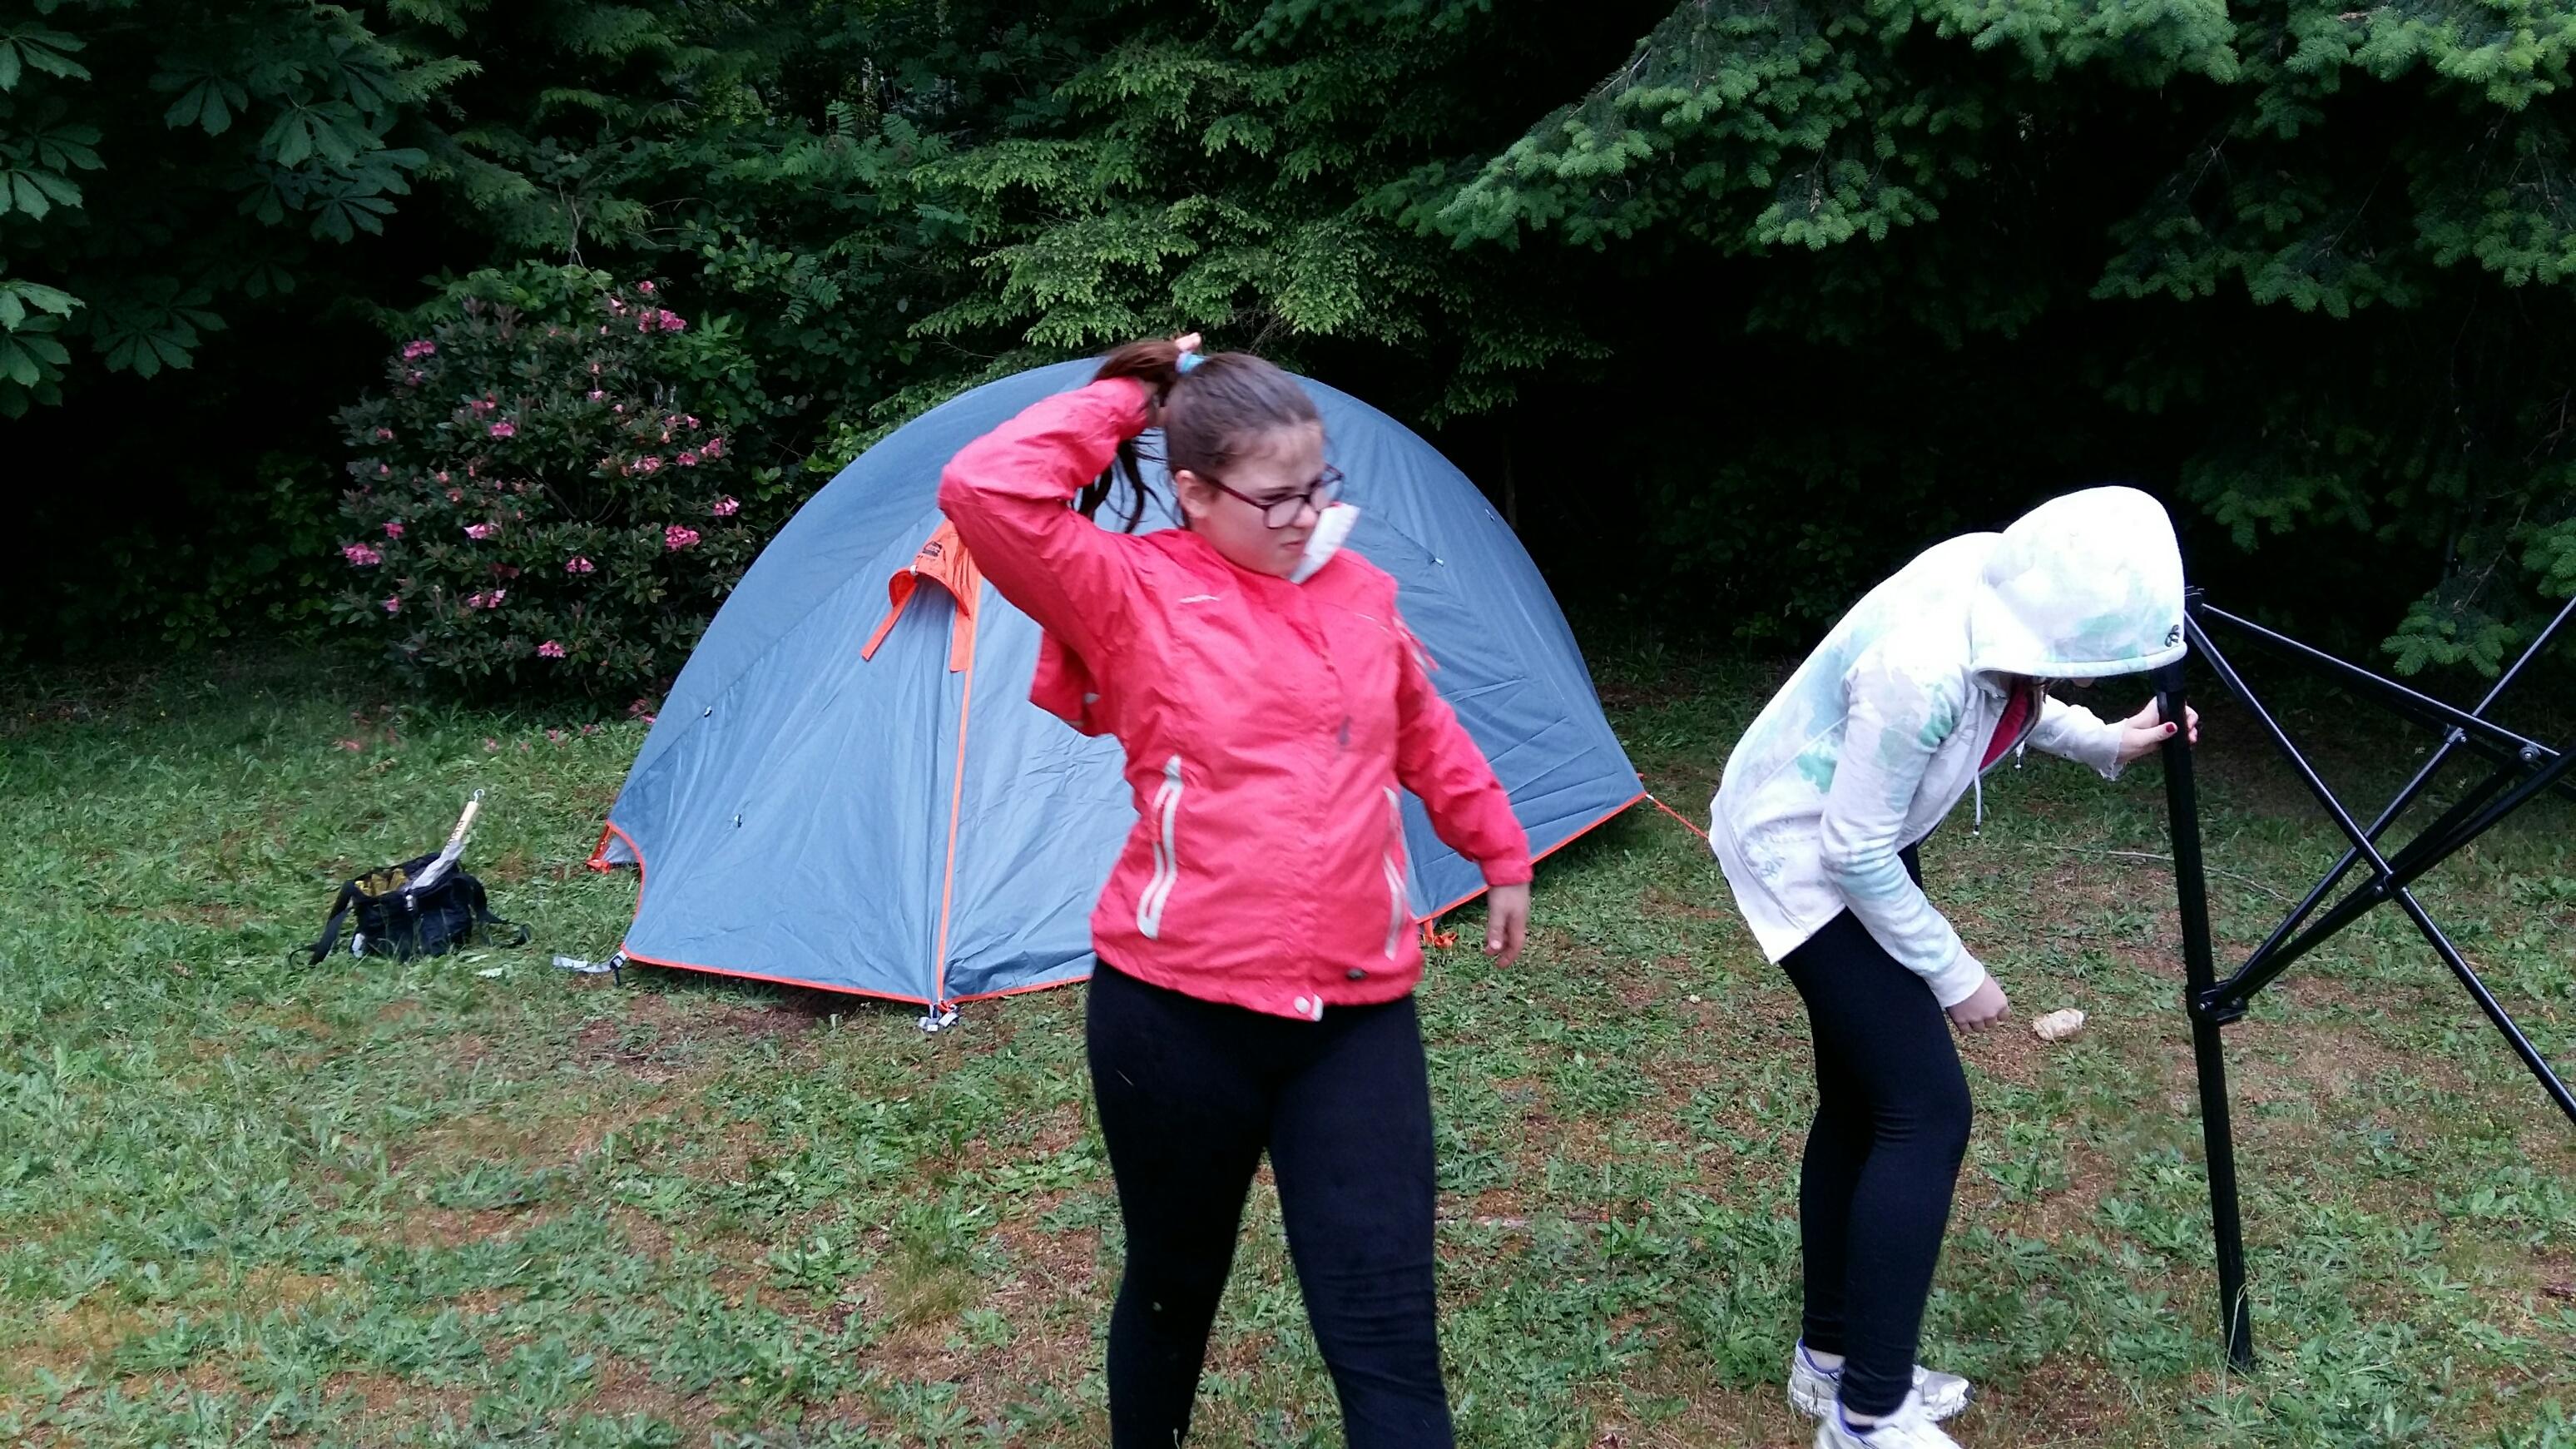 Pathfinder camp